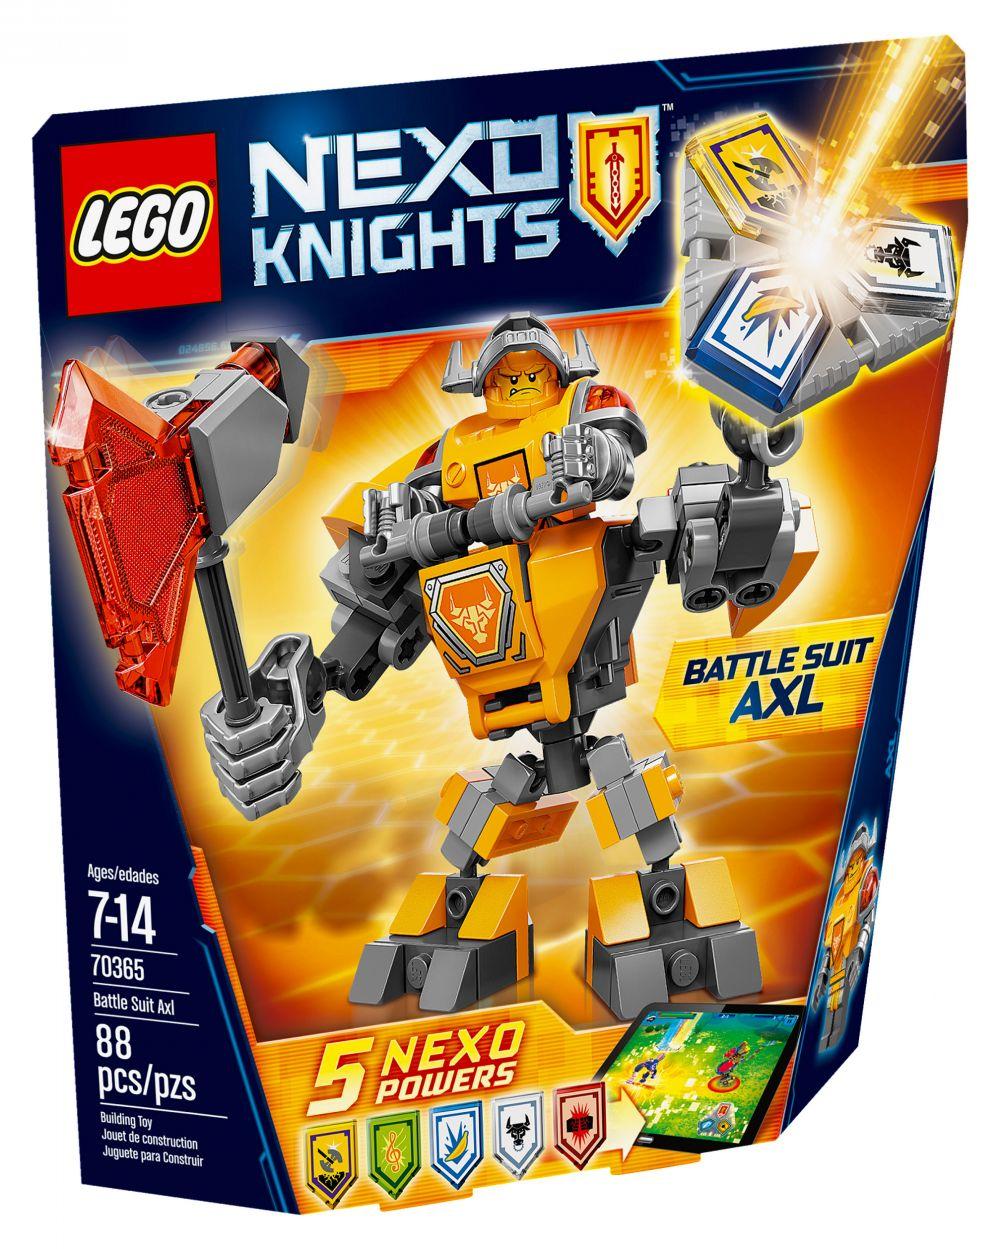 LEGO Nexo Knights 70365 pas cher, La super armure d'Axl